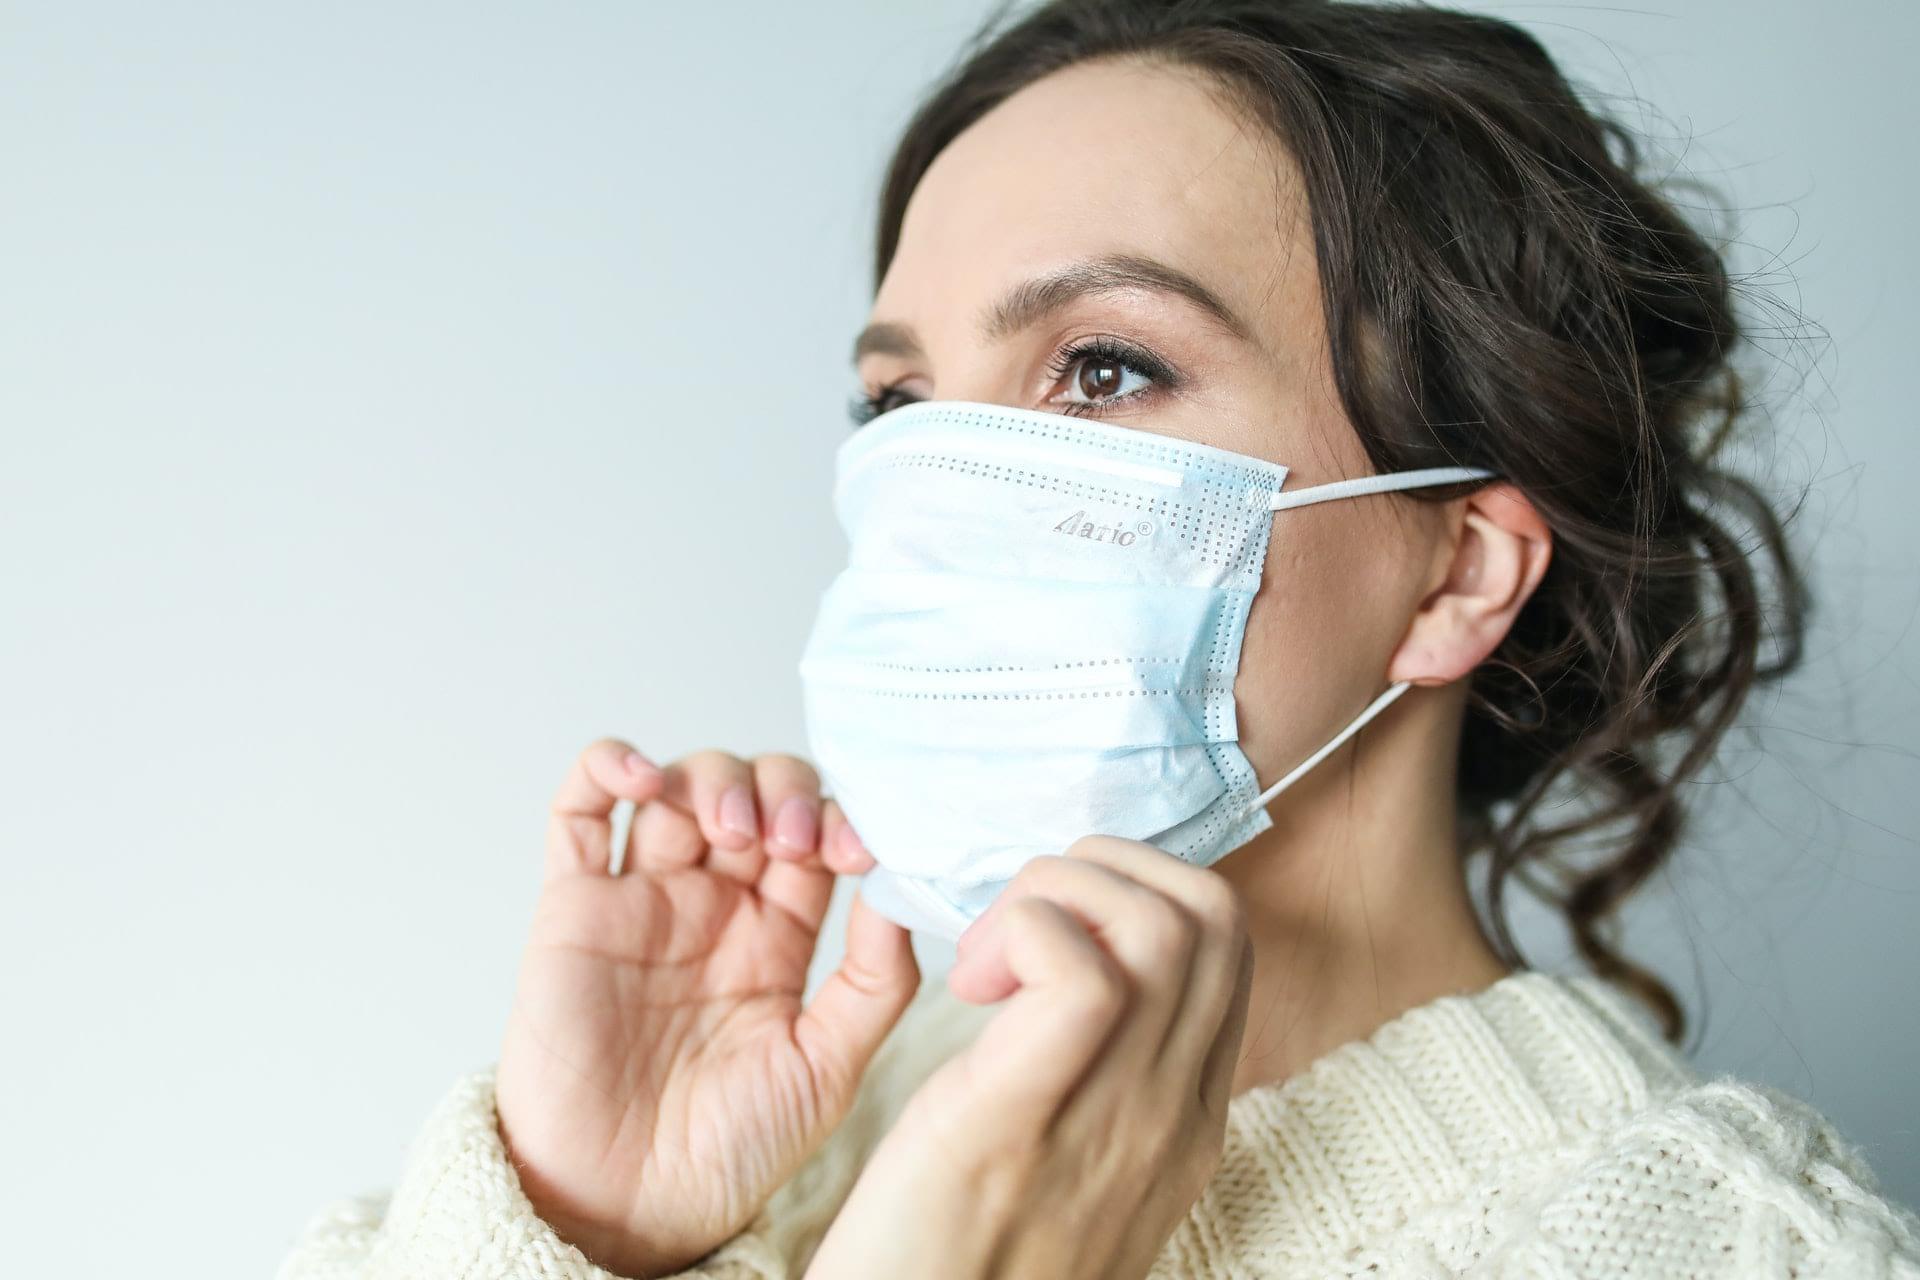 woman wearing a face mask